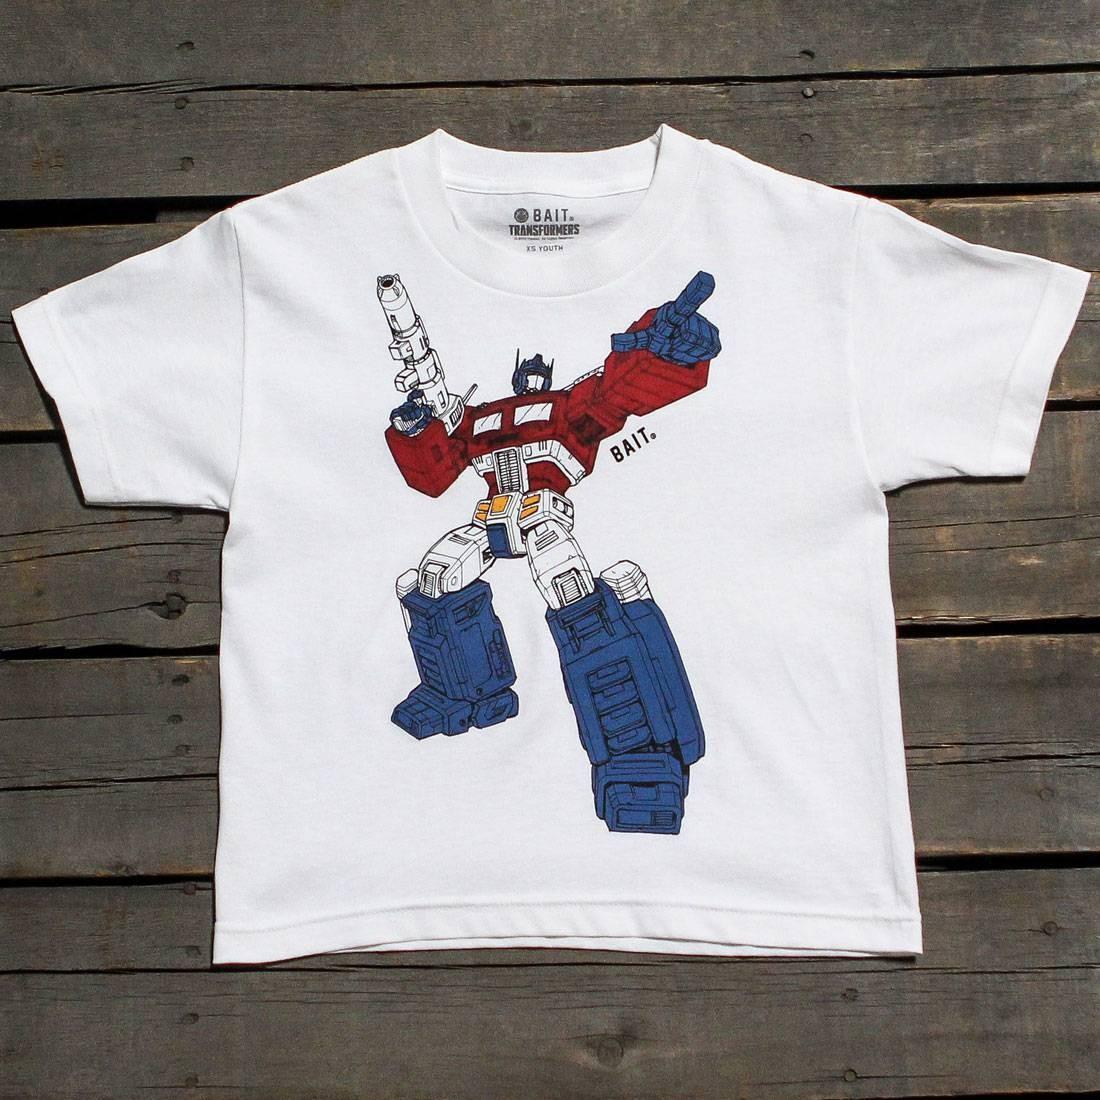 BAIT x Transformers Optimus Art Youth Tee (white)